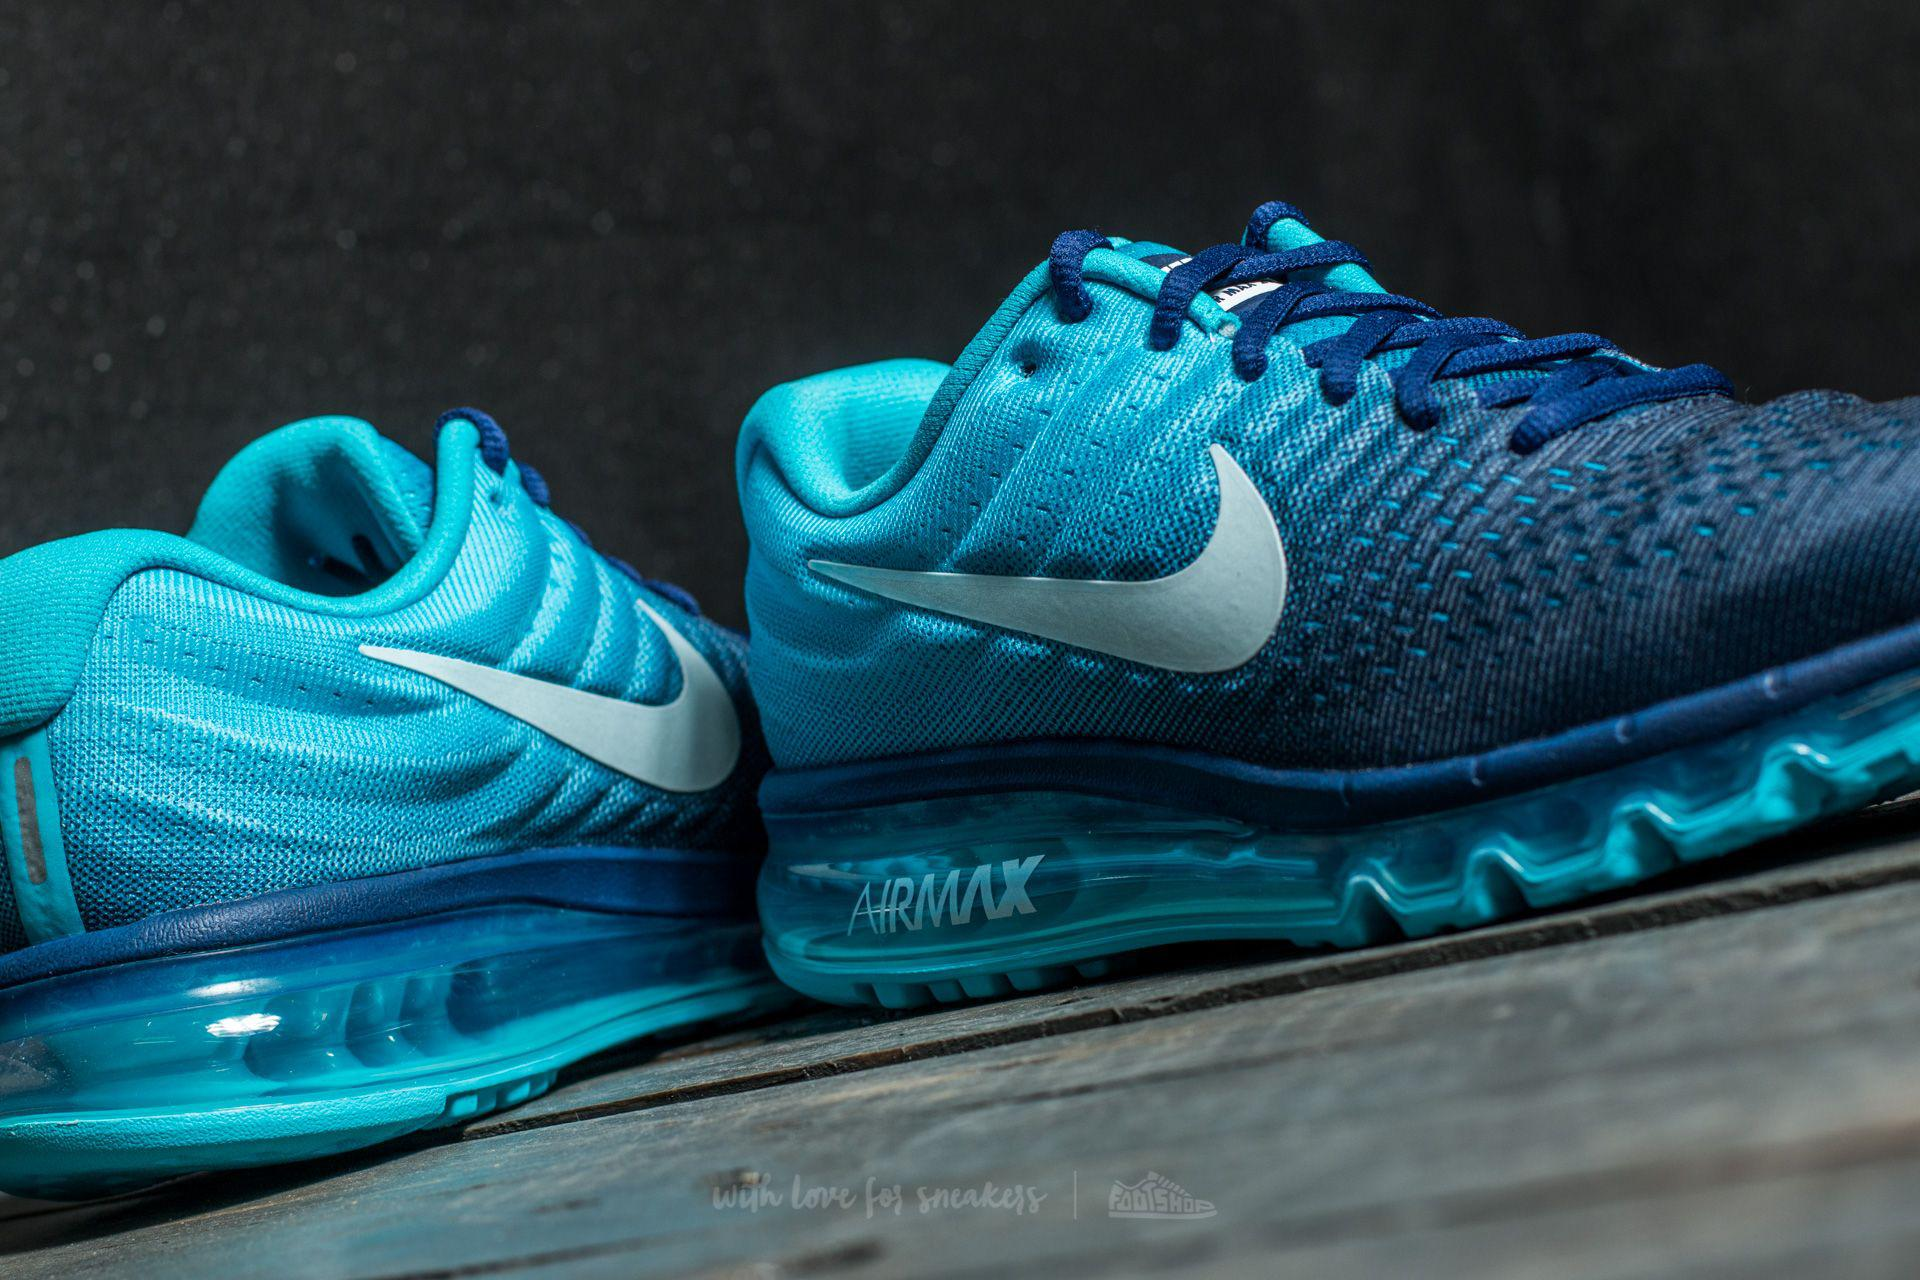 Air Max 2017 Binary Blue/ Glacier Blue